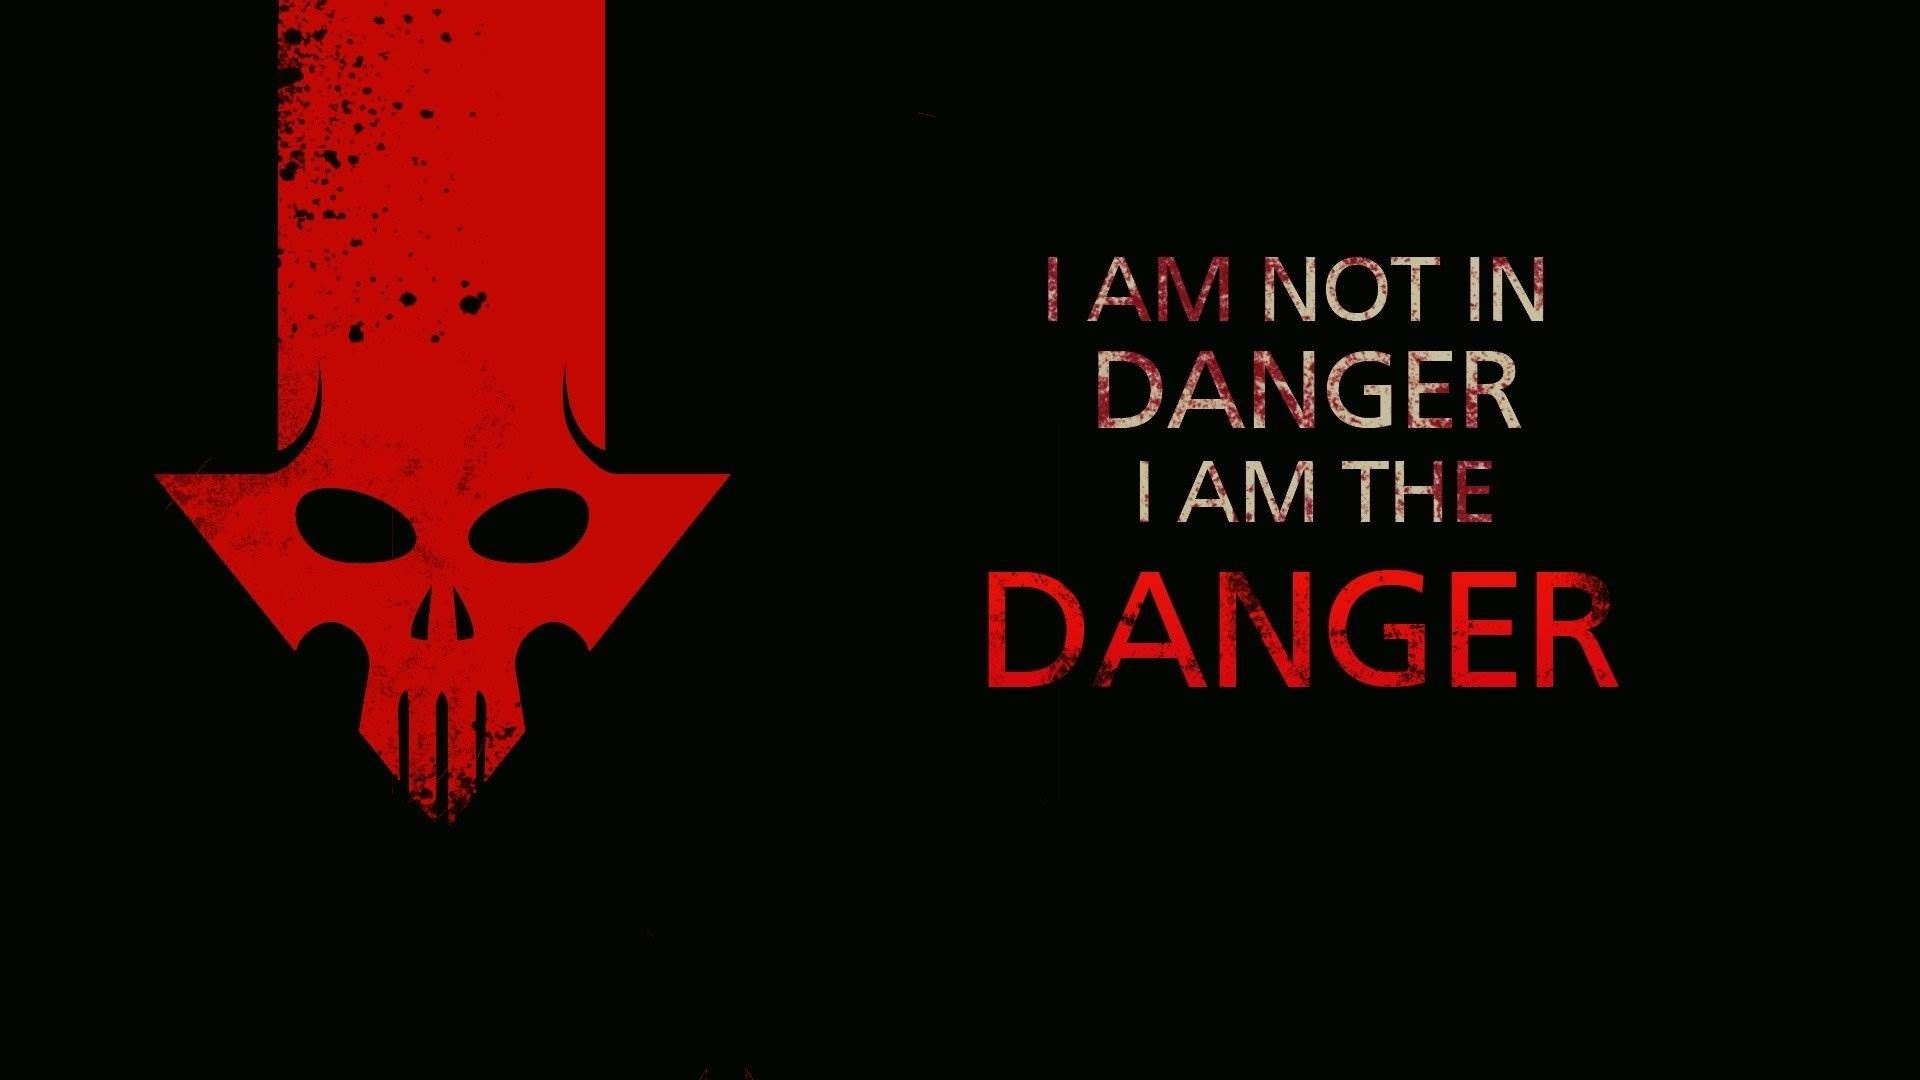 Danger PC Wallpaper HD